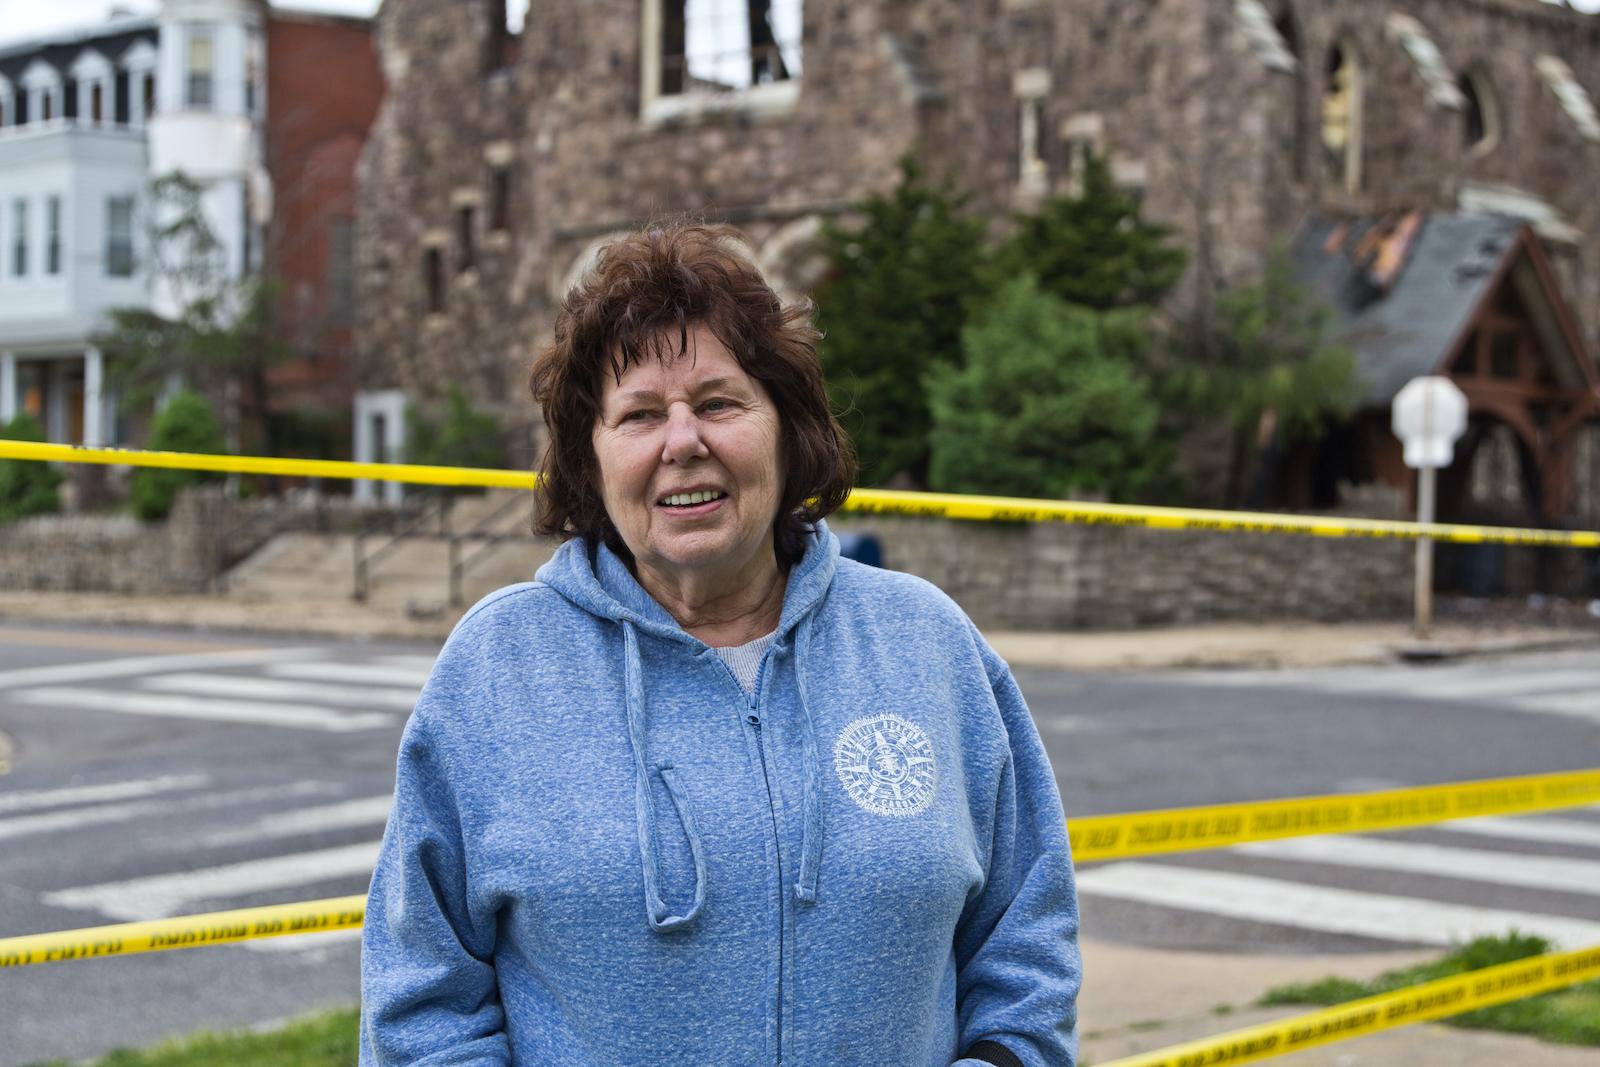 Barbara Kemery stands outside St. Leo's